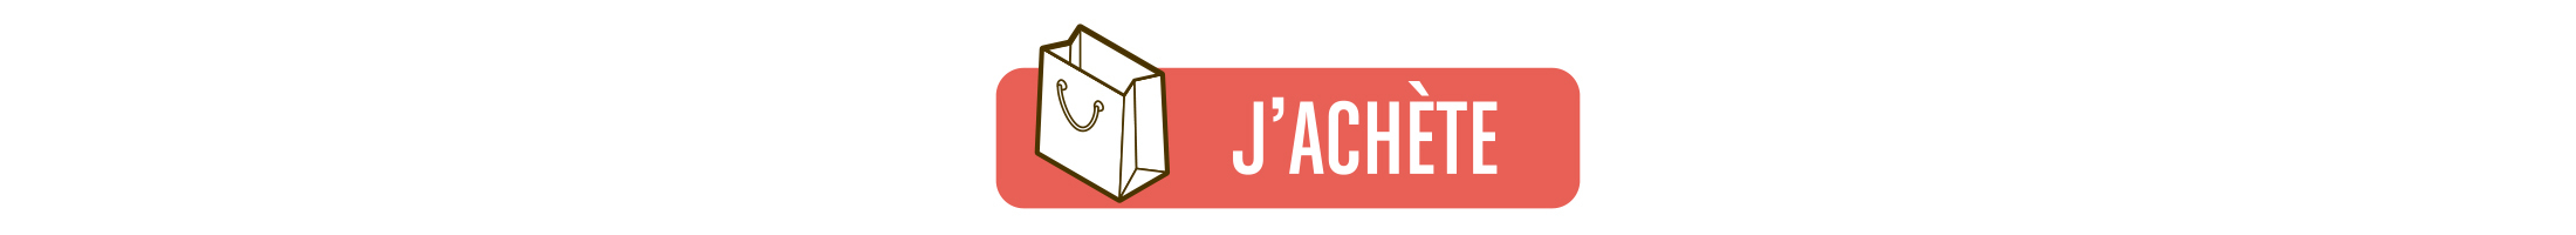 Belledonne Boutons CHOCO Jachete